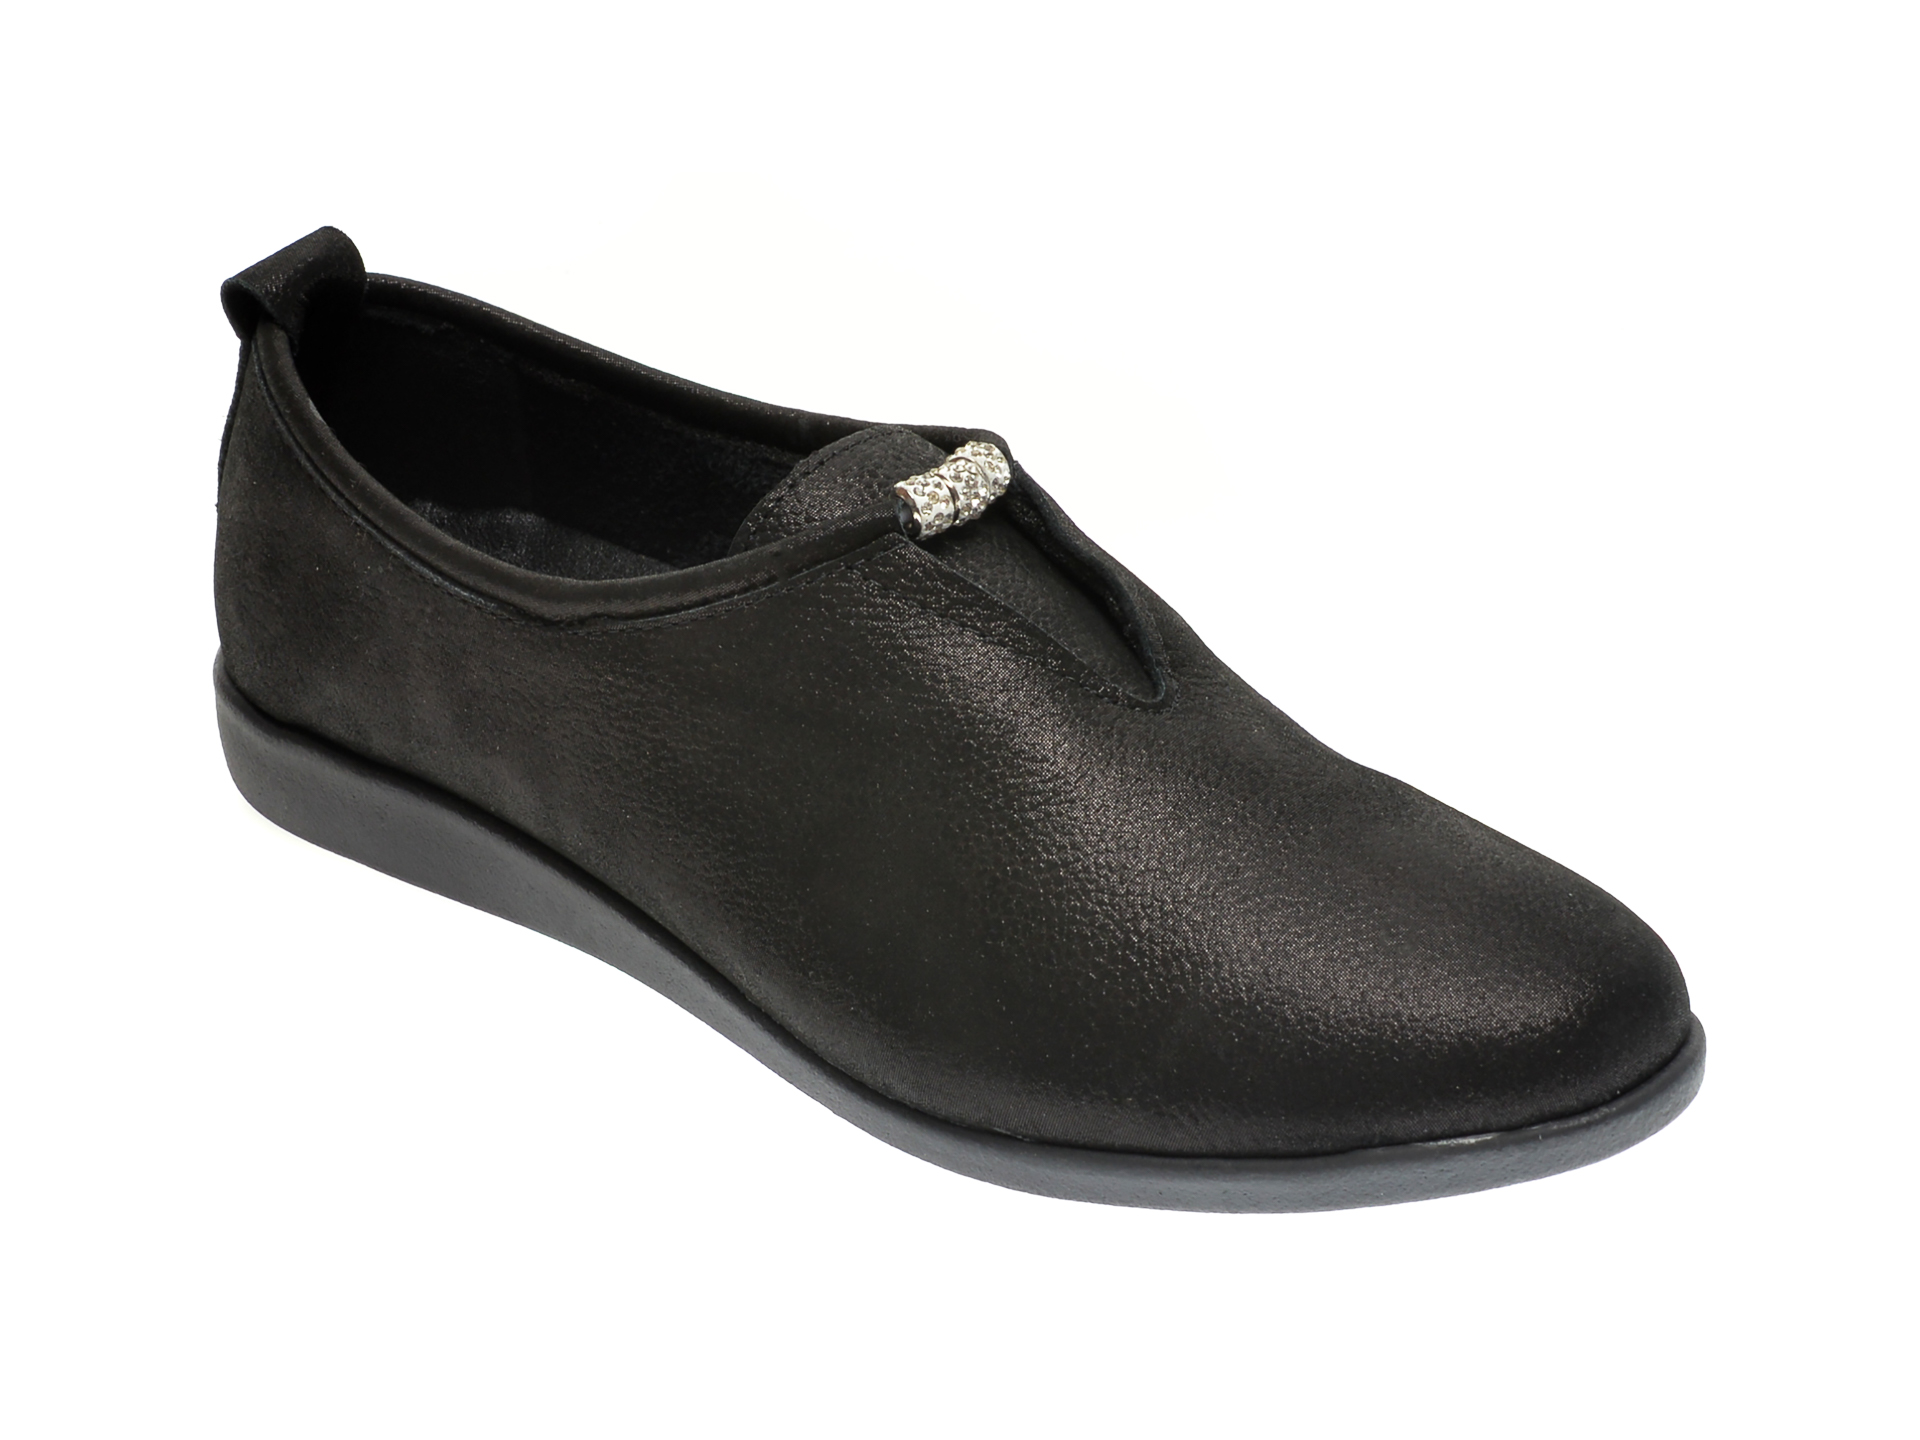 Pantofi ILOZ negri, 120, din piele naturala imagine